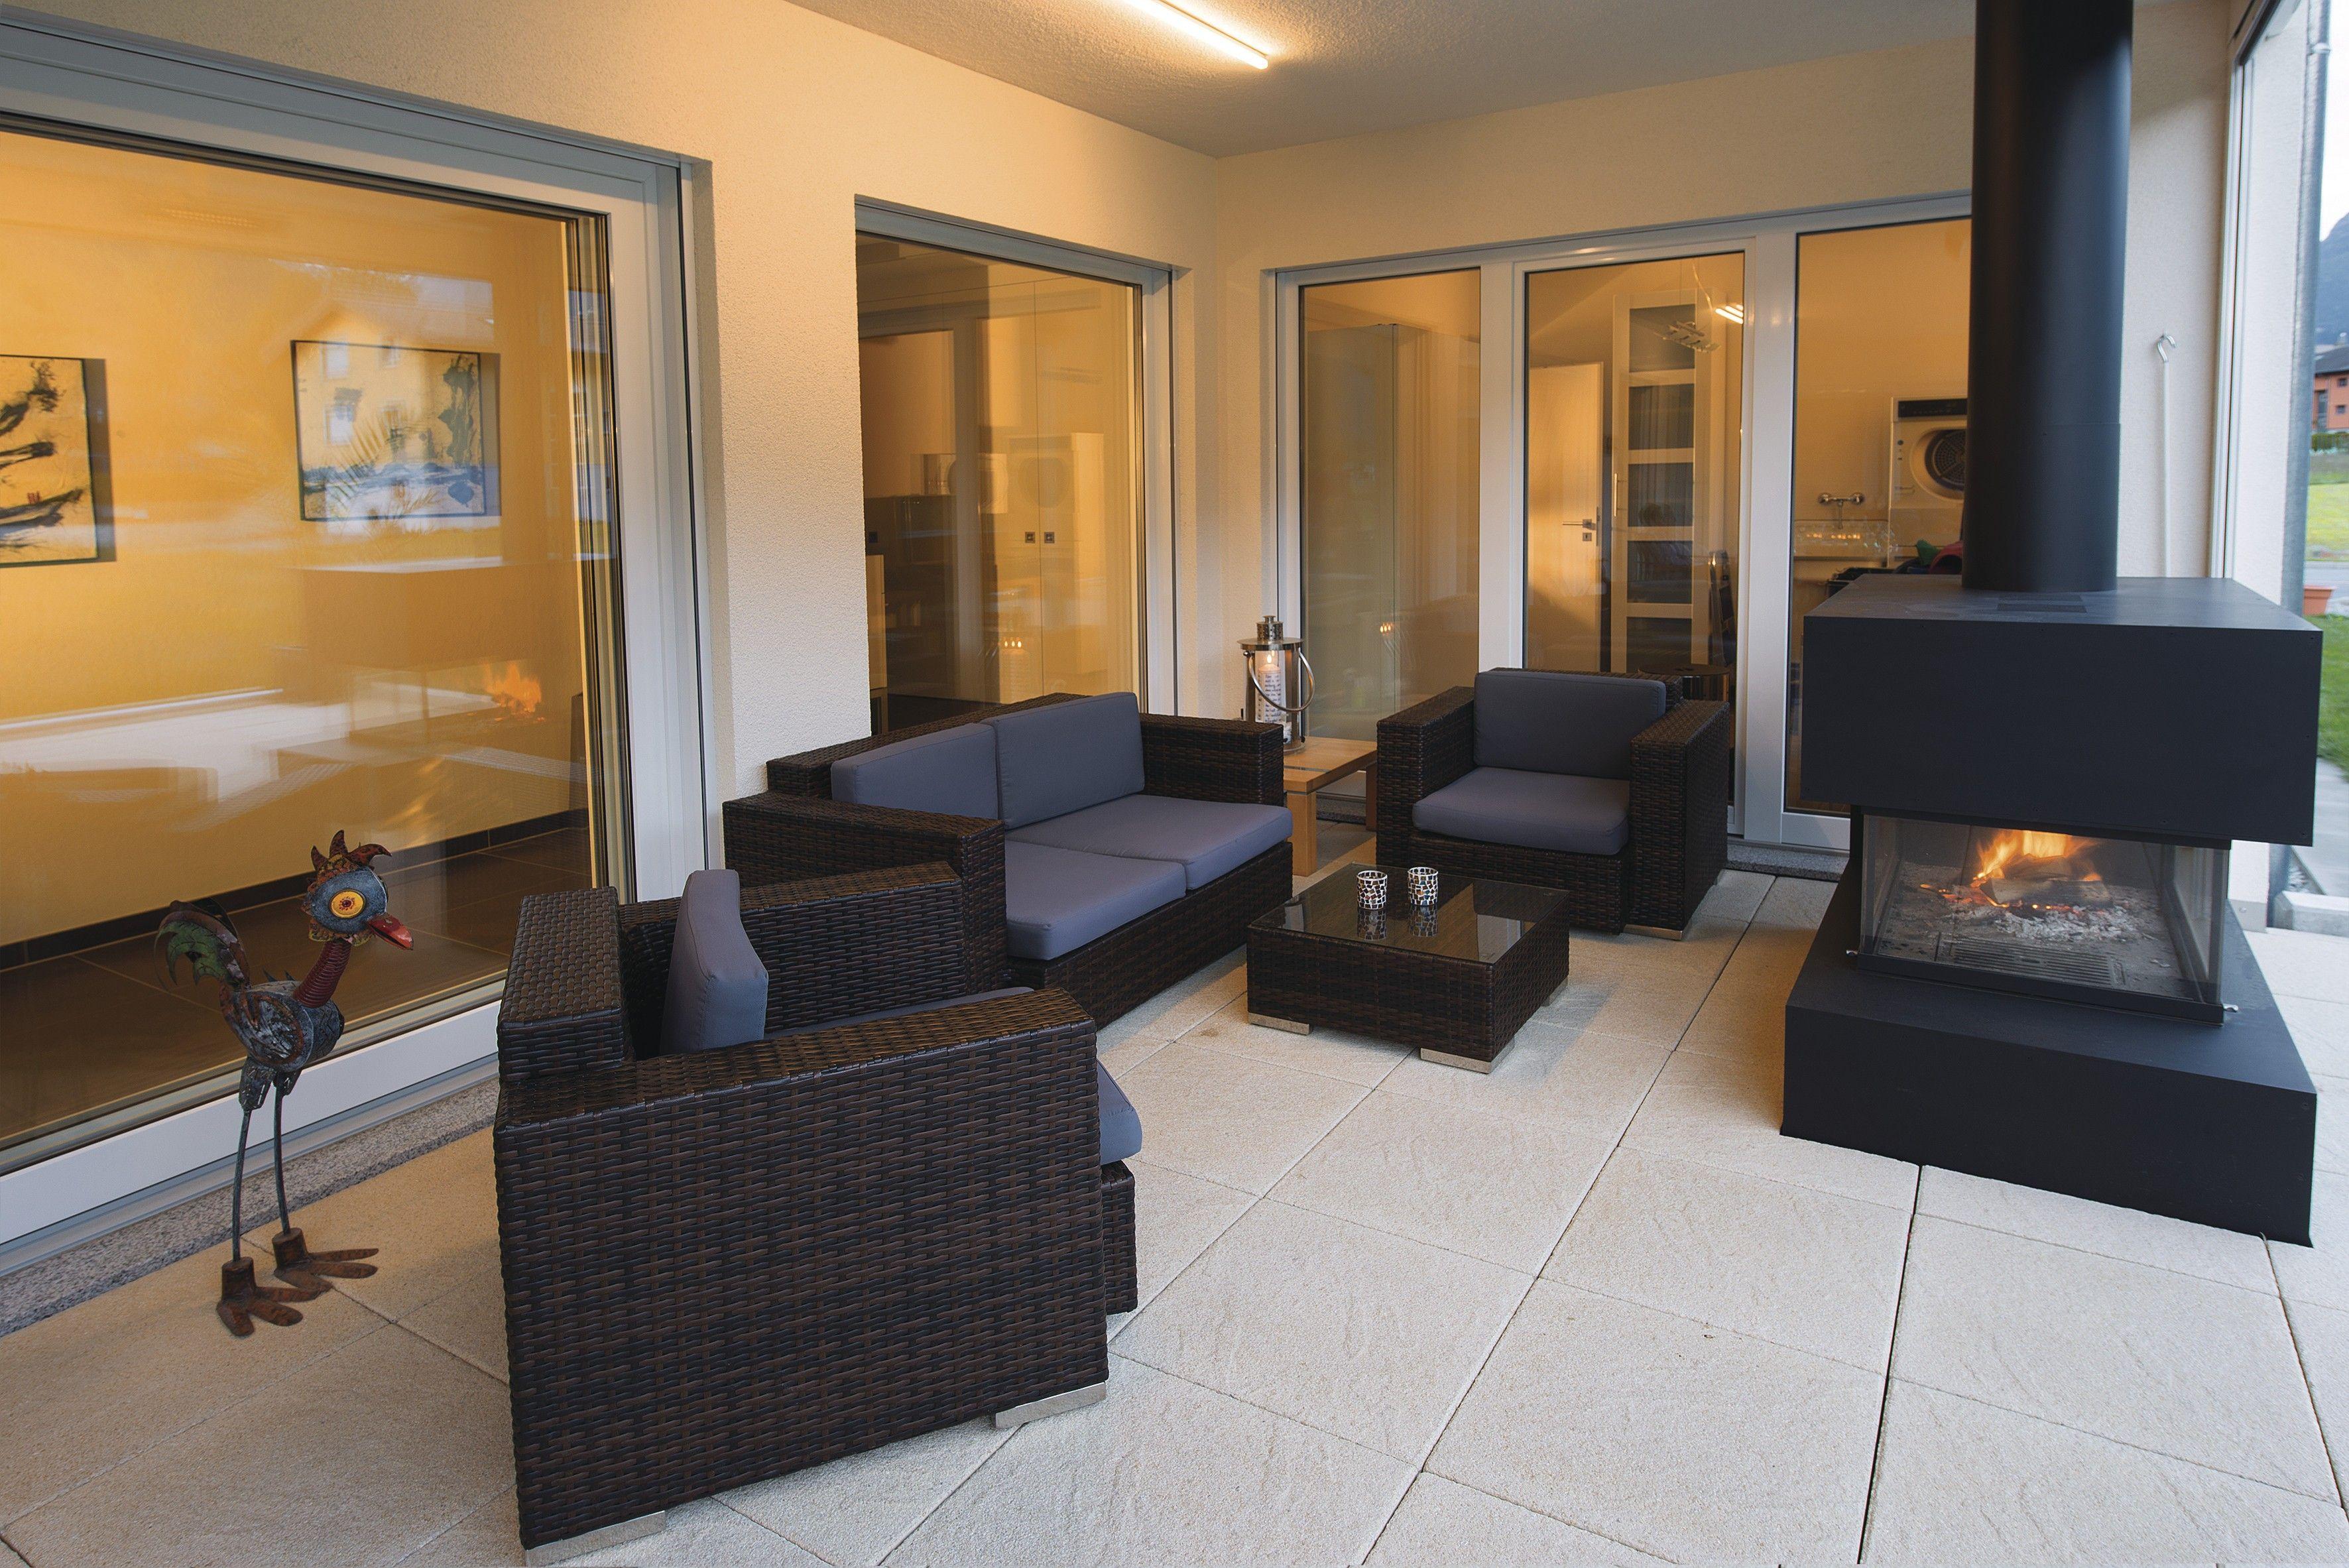 Terrasse #Ebenerdig #Bungalow #Korbmöbel #Aussenkamin | Kundenhäuser